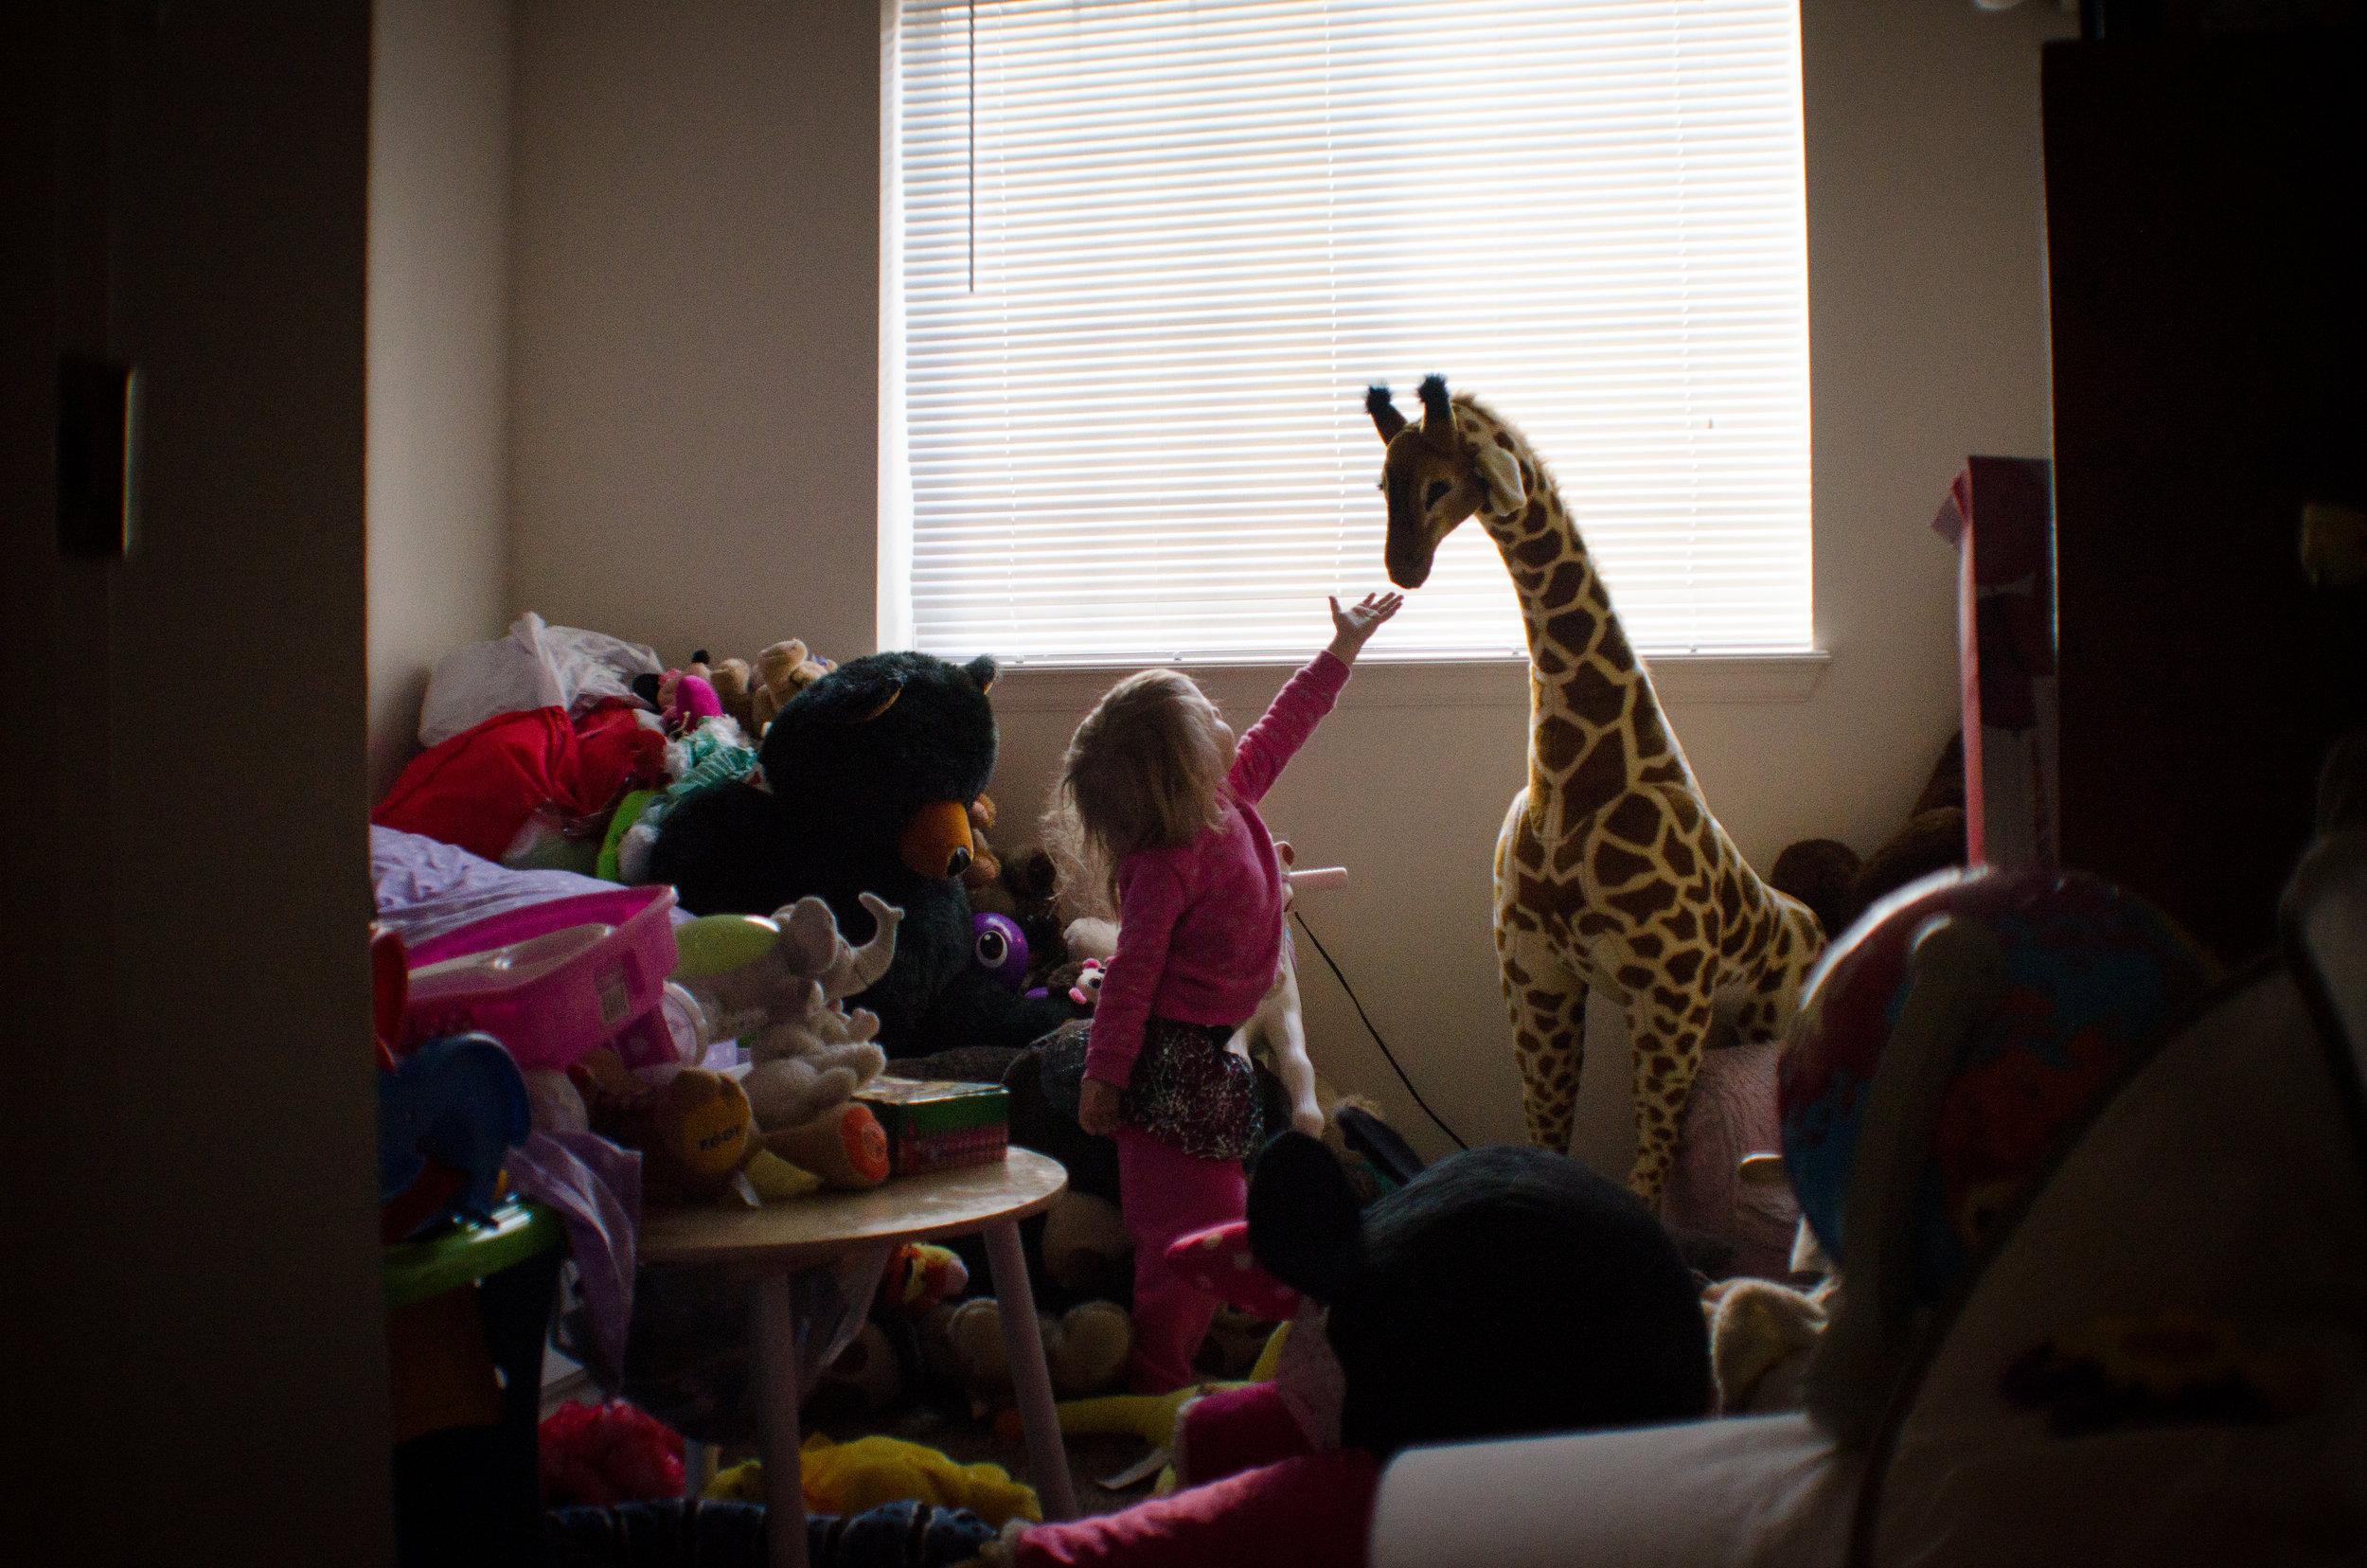 clutter home, true images, toddler room